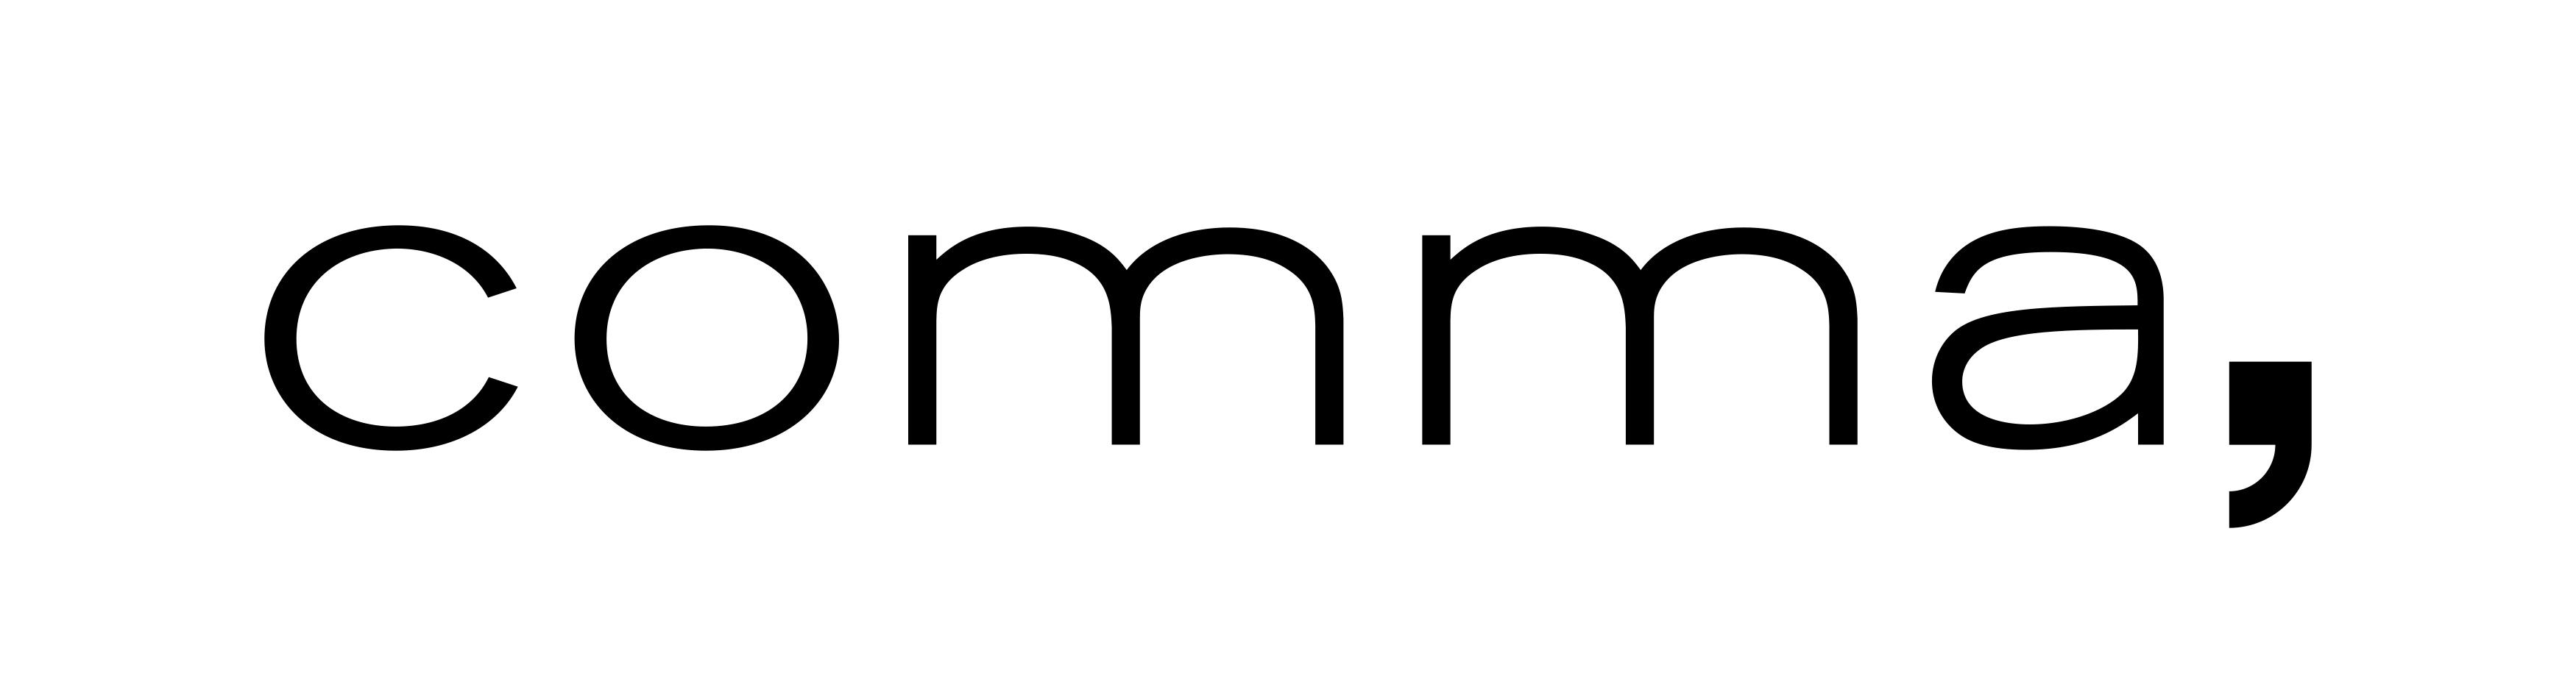 comma_logo.jpg